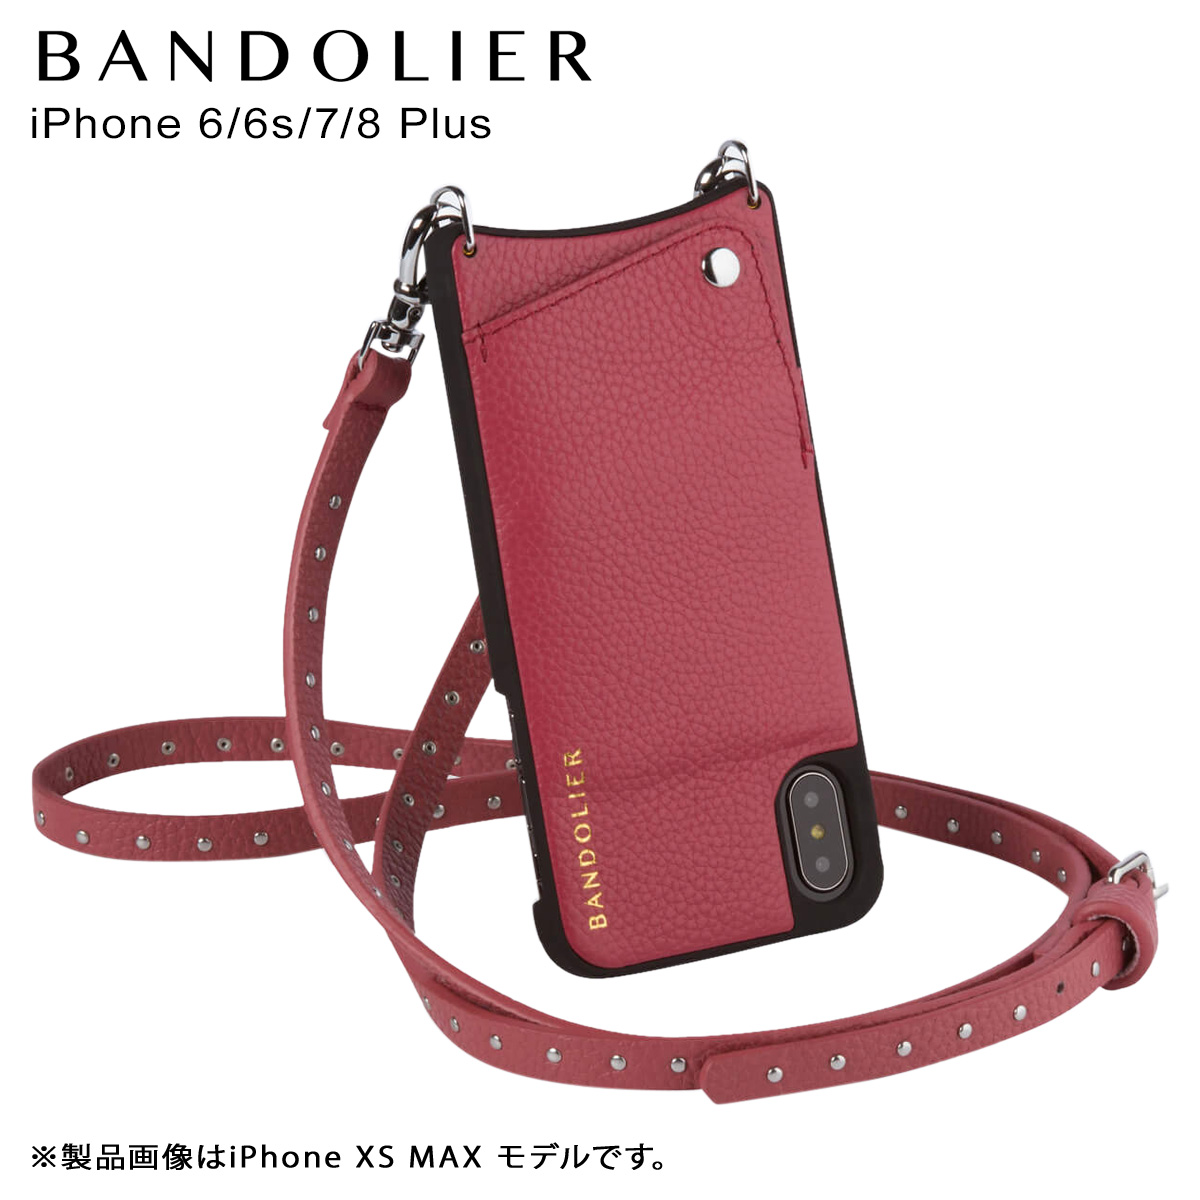 BANDOLIER iPhone8Plus iPhone7Plus 6sPlus NICOLE MAGENTA RED バンドリヤー ケース ショルダー スマホ アイフォン レザー メンズ レディース マゼンタ レッド 10NIC1001